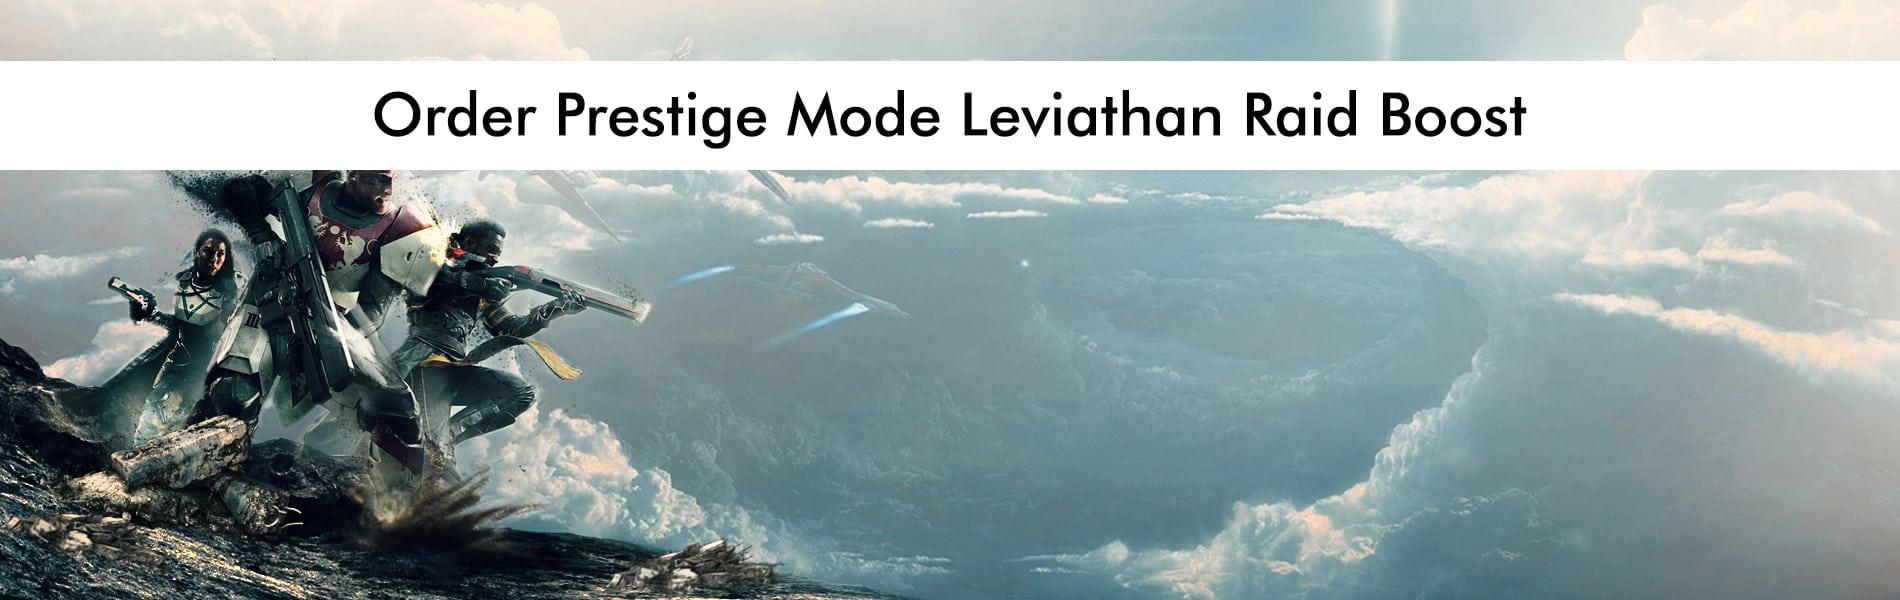 order prestige mode boost